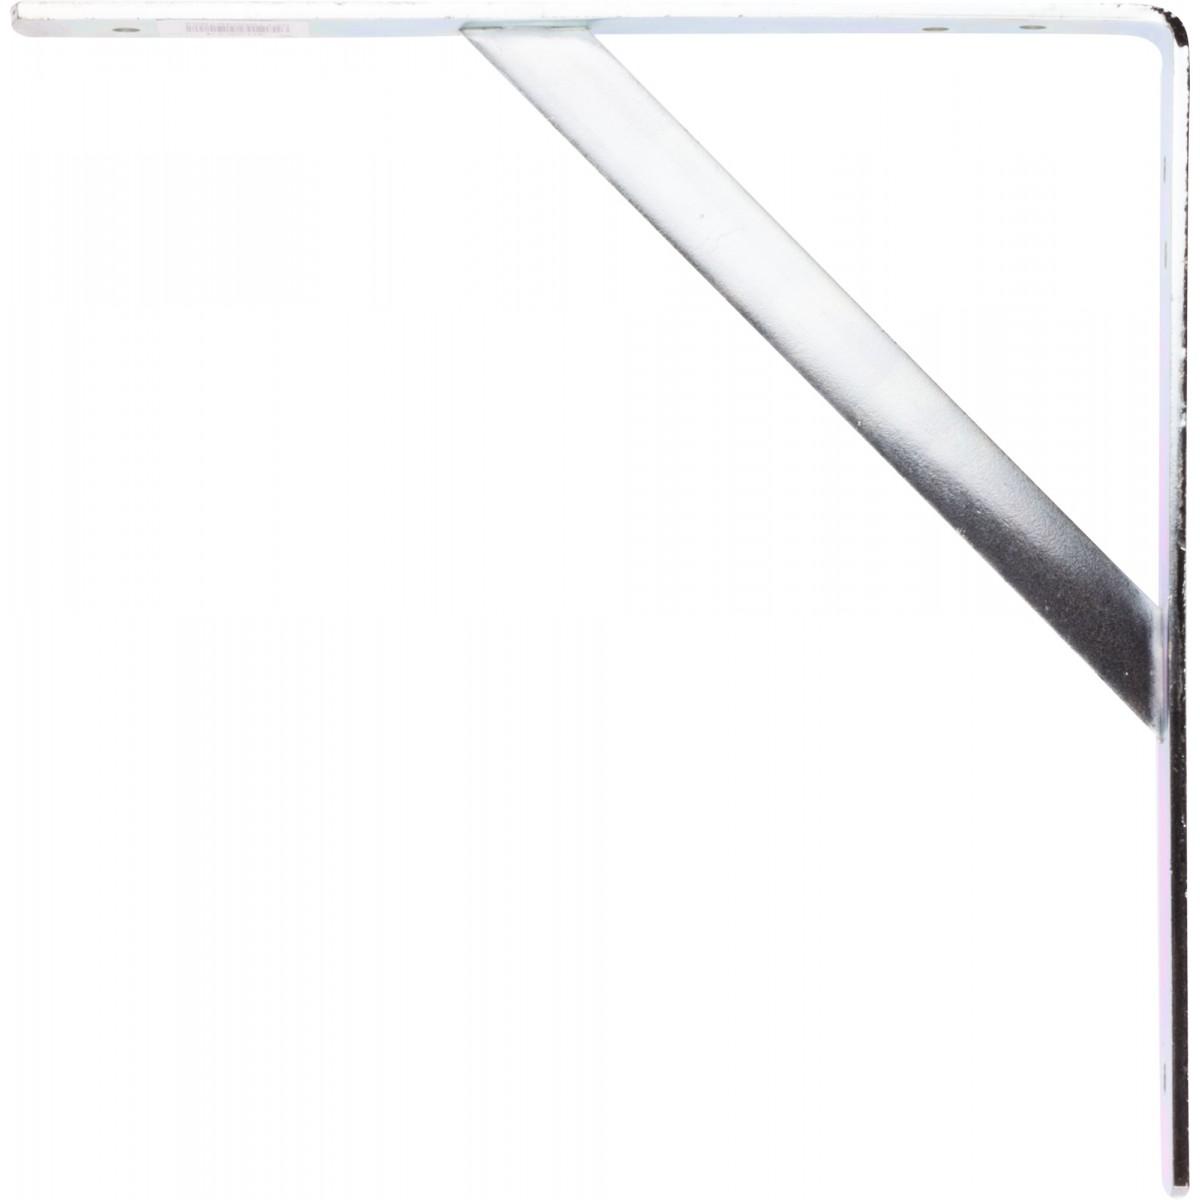 Equerre zinguée blanche renforcée Torbel - Dimensions 250 x 250 mm